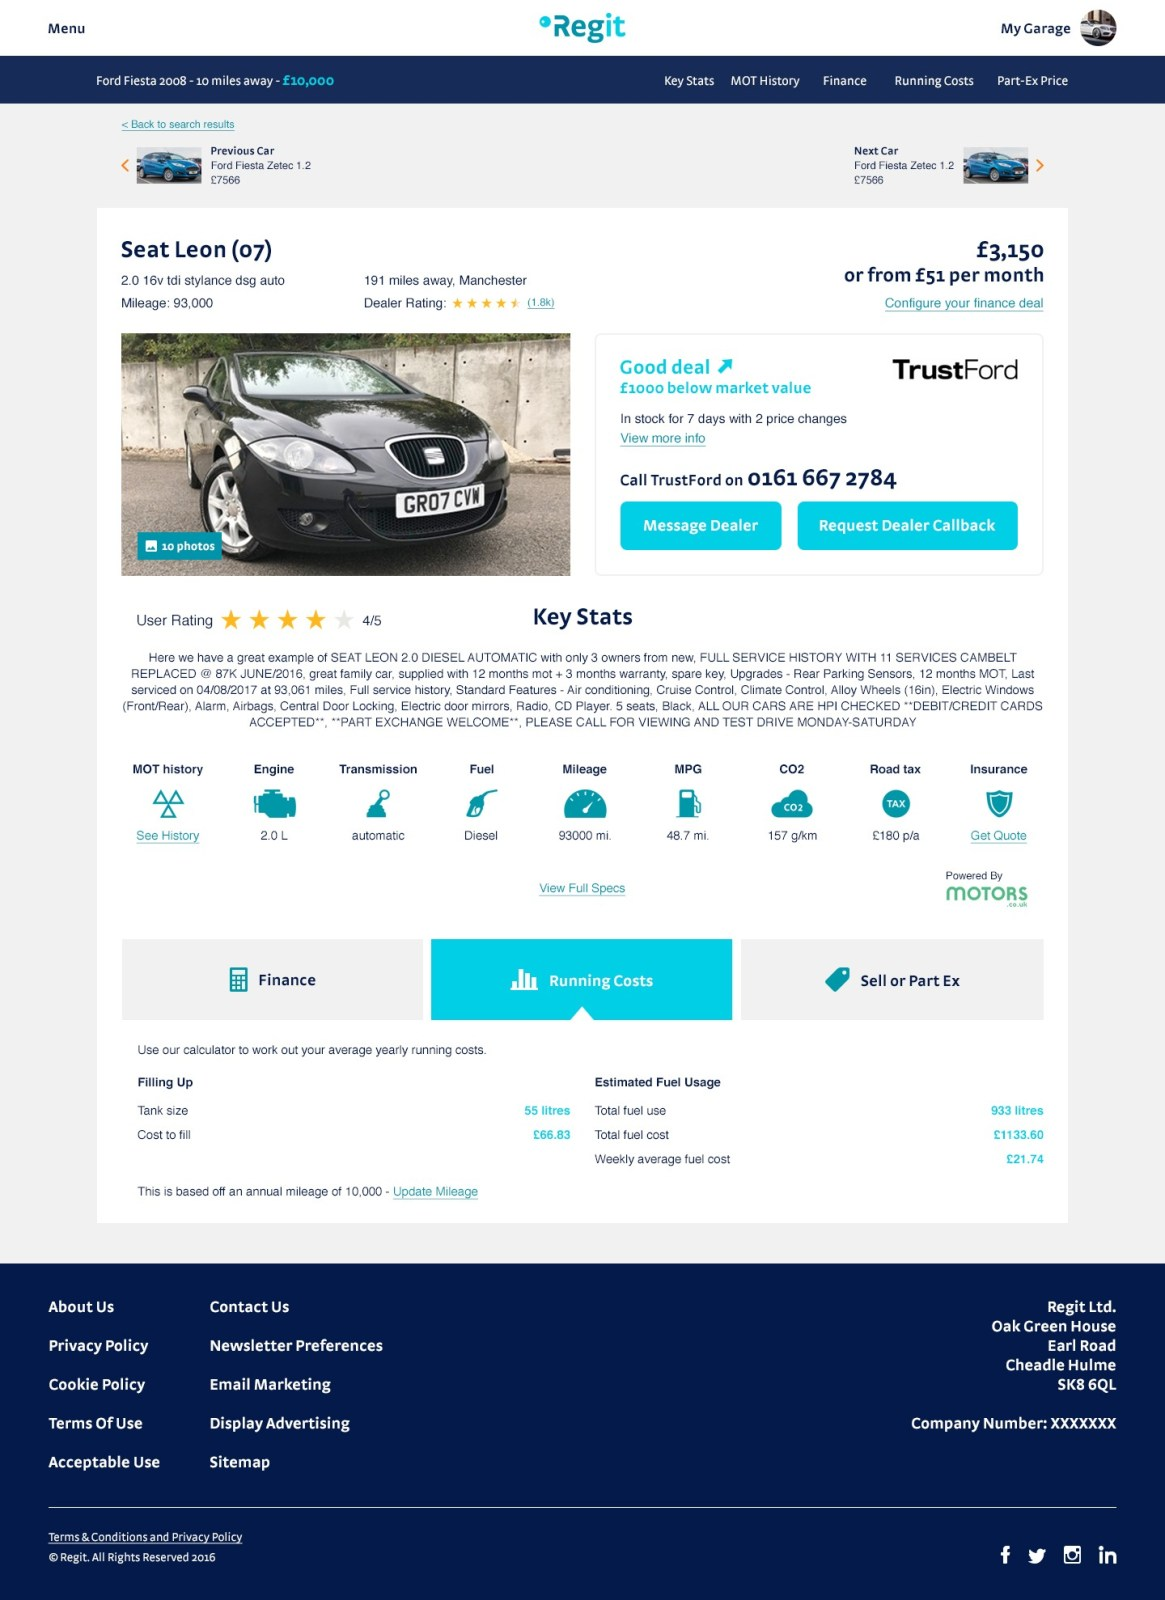 Regit used car page design